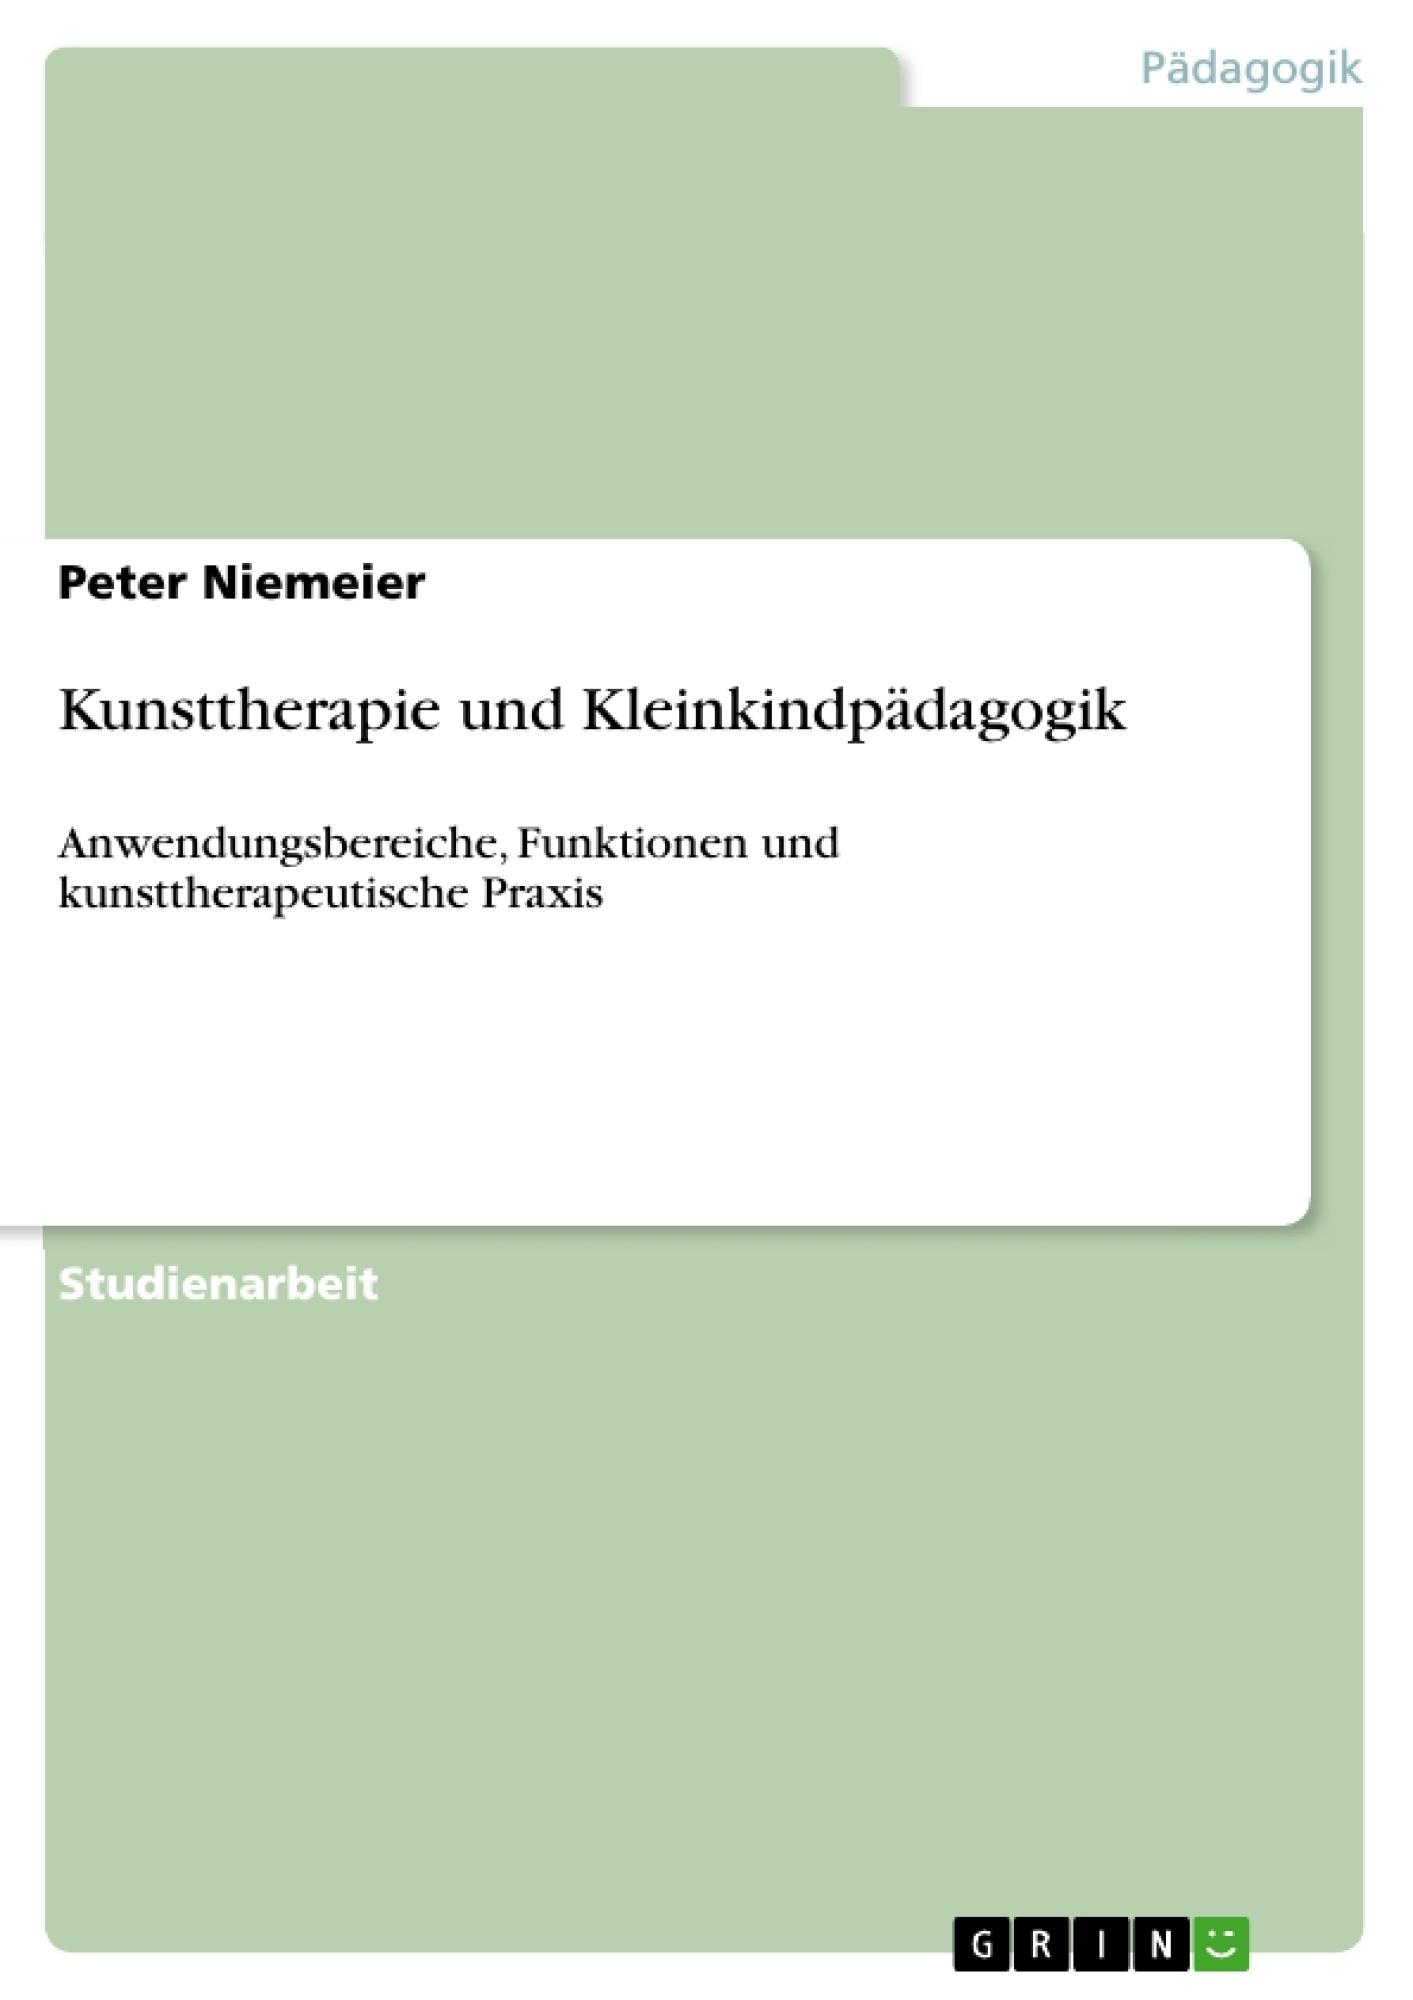 Titel: Kunsttherapie und Kleinkindpädagogik